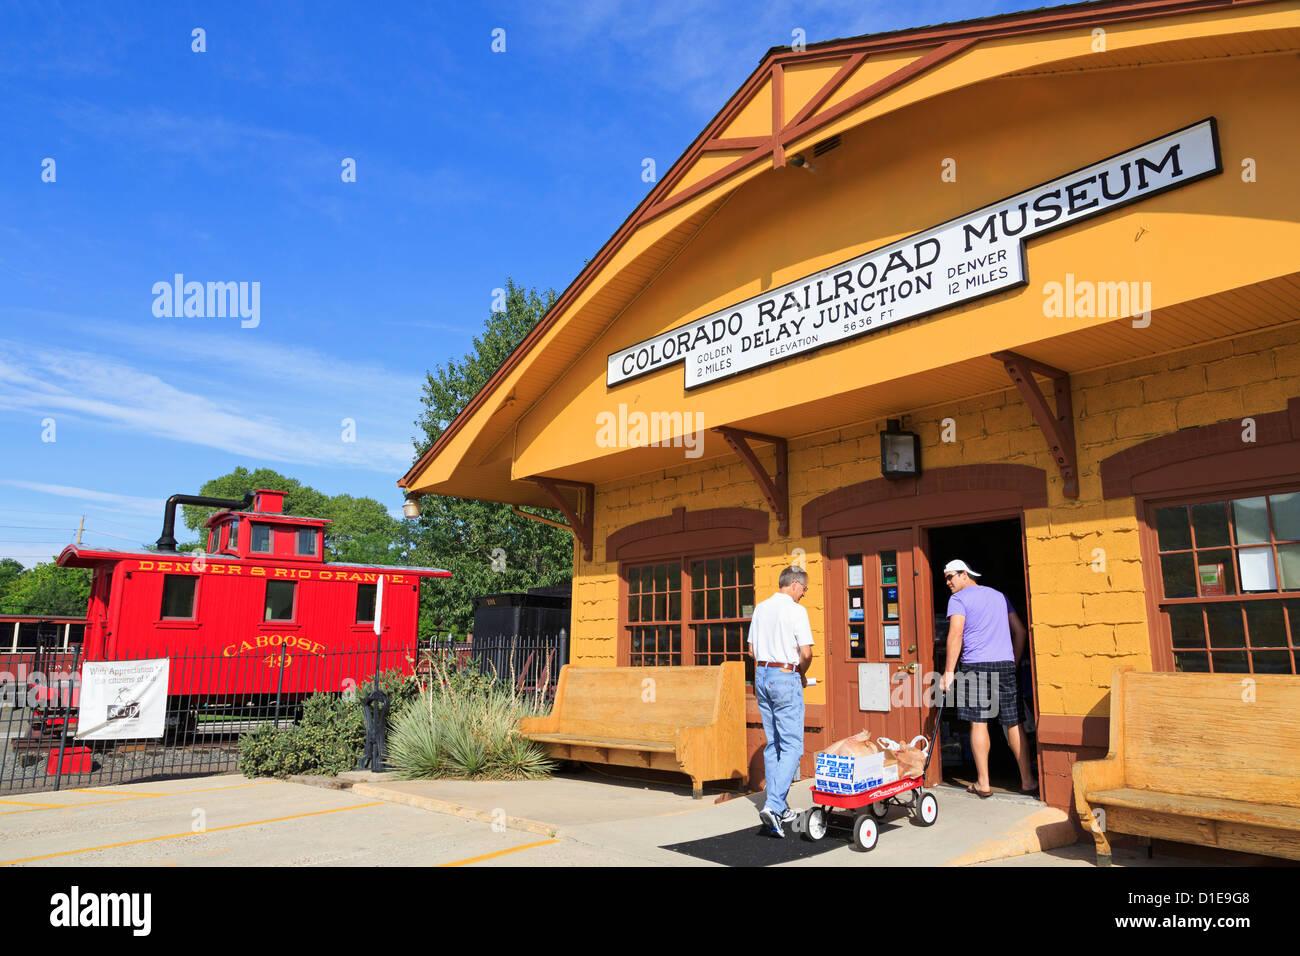 Colorado Railroad Museum, Golden, Colorado, United States of America, North America - Stock Image